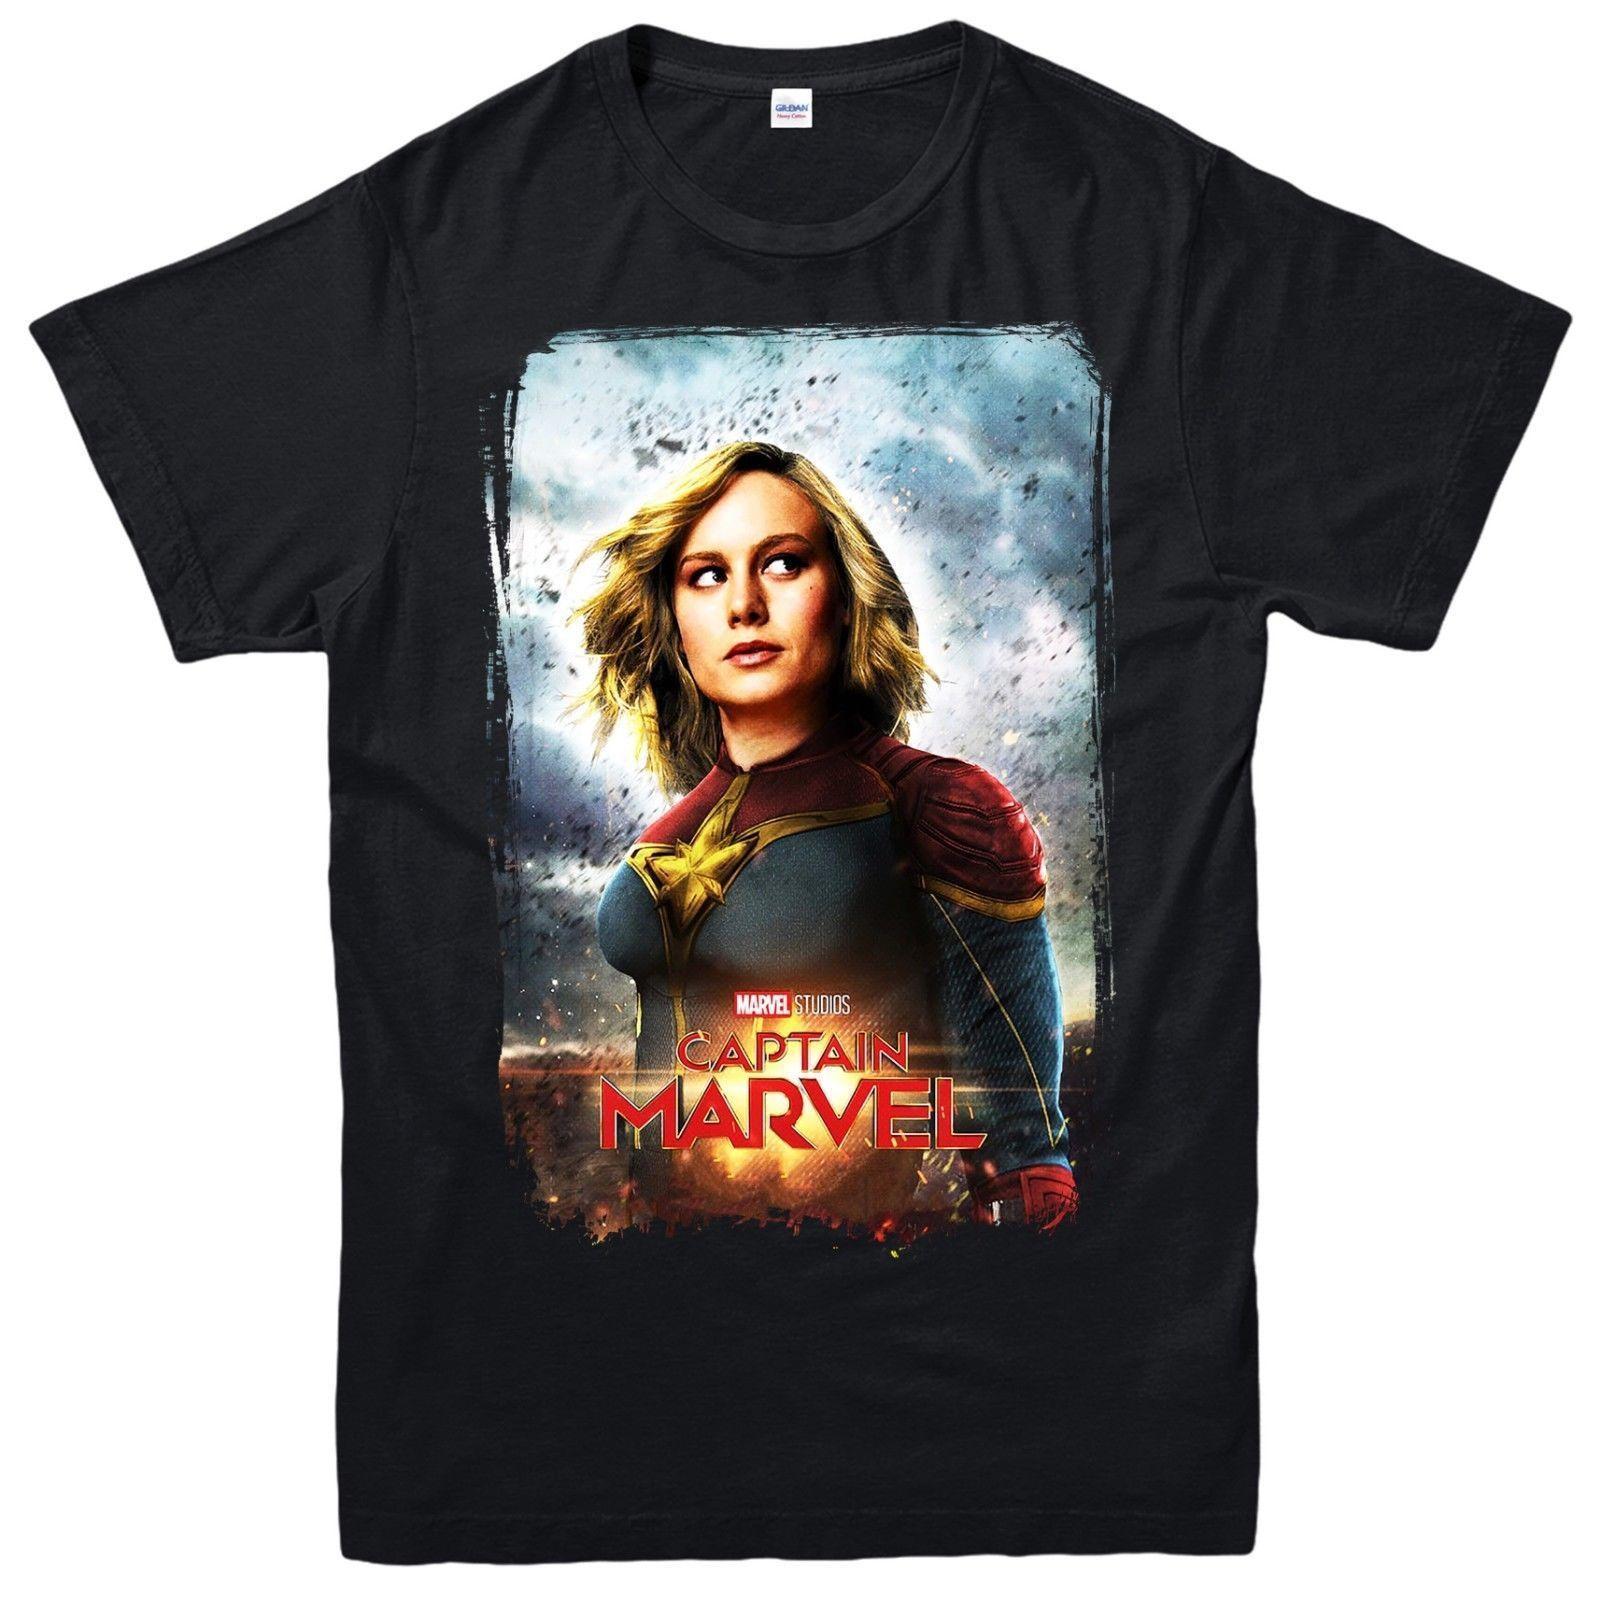 9f056880d22 Compre Capitán Marvel Camiseta Avengers Superhéroe Comic Top Unisex Hombres  Mujeres Kid Tee Top Venta Al Por Mayor Barata Tees100% Algodón Para ManT ...